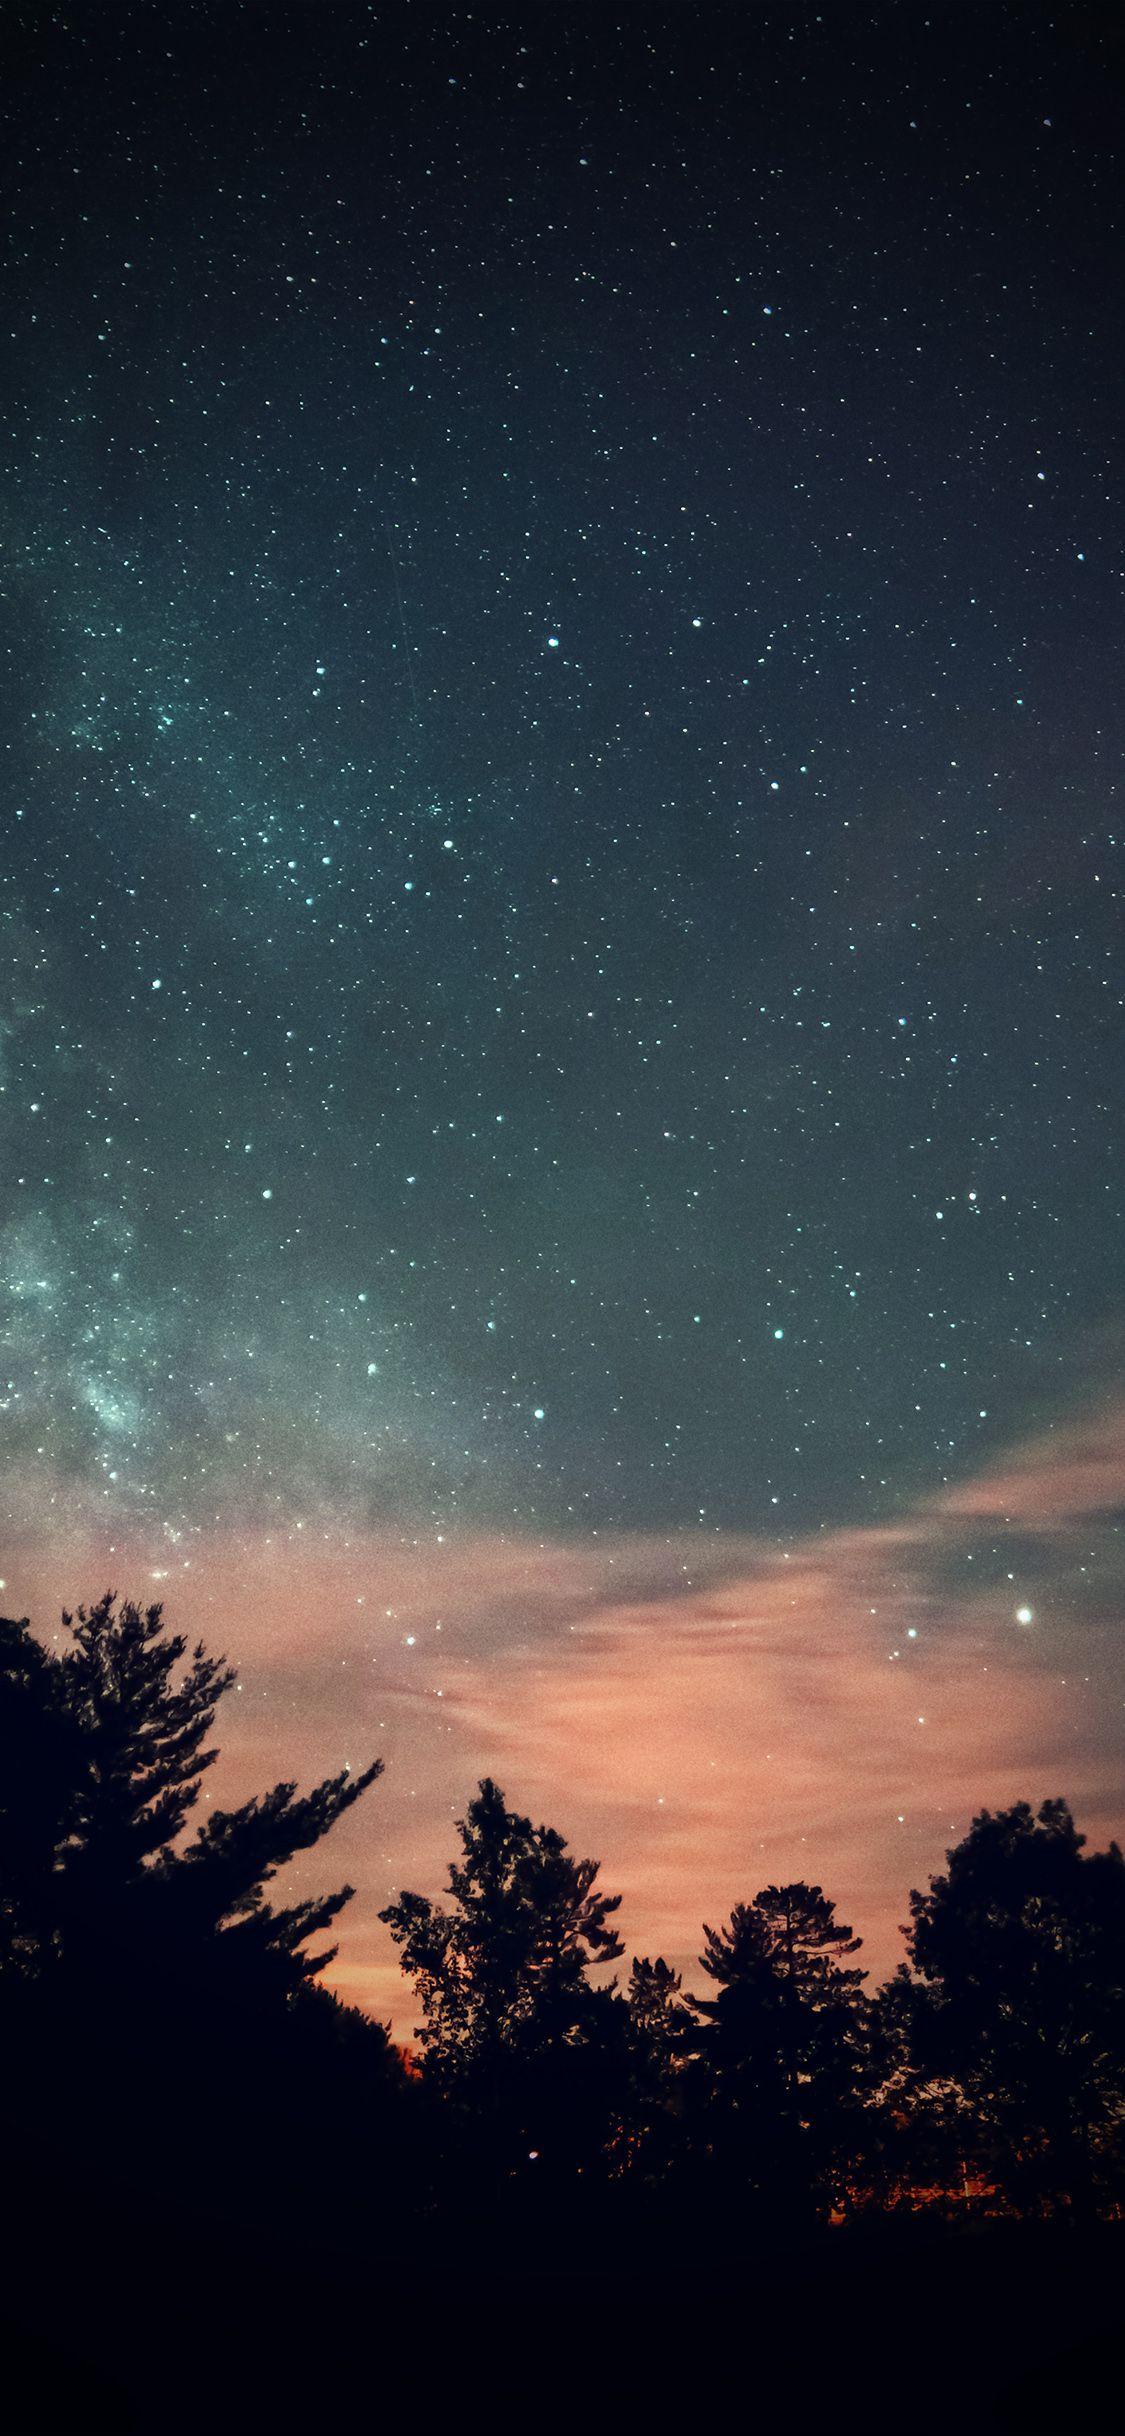 Mv75 Sky Night Star Dark Mountain Cloud Vignette Via Http Iphonexpapers Com Wallpapers Night Sky Wallpaper Dark Wallpaper Iphone Dark Background Wallpaper